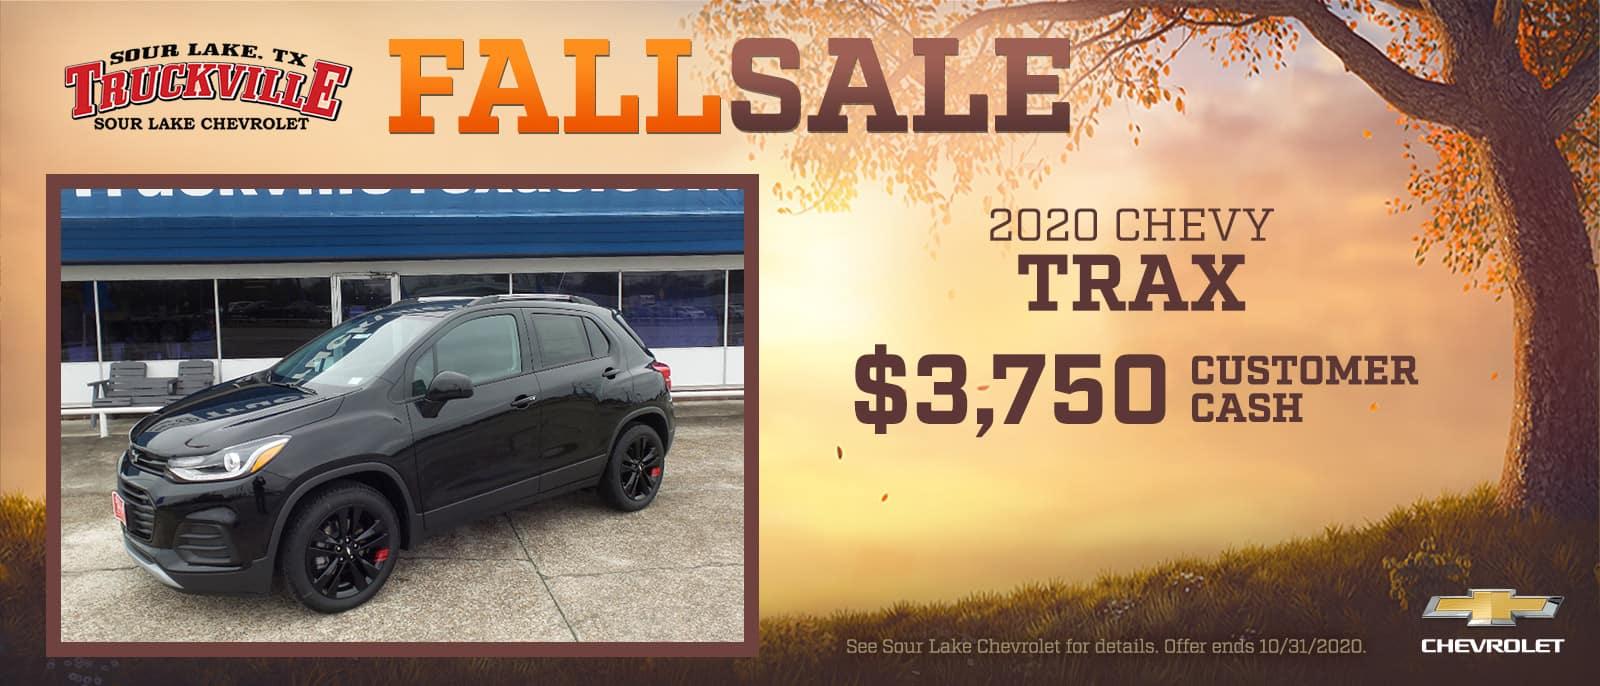 2020 Chevrolet Trax Fall Sale Event | Sour Lake, TX